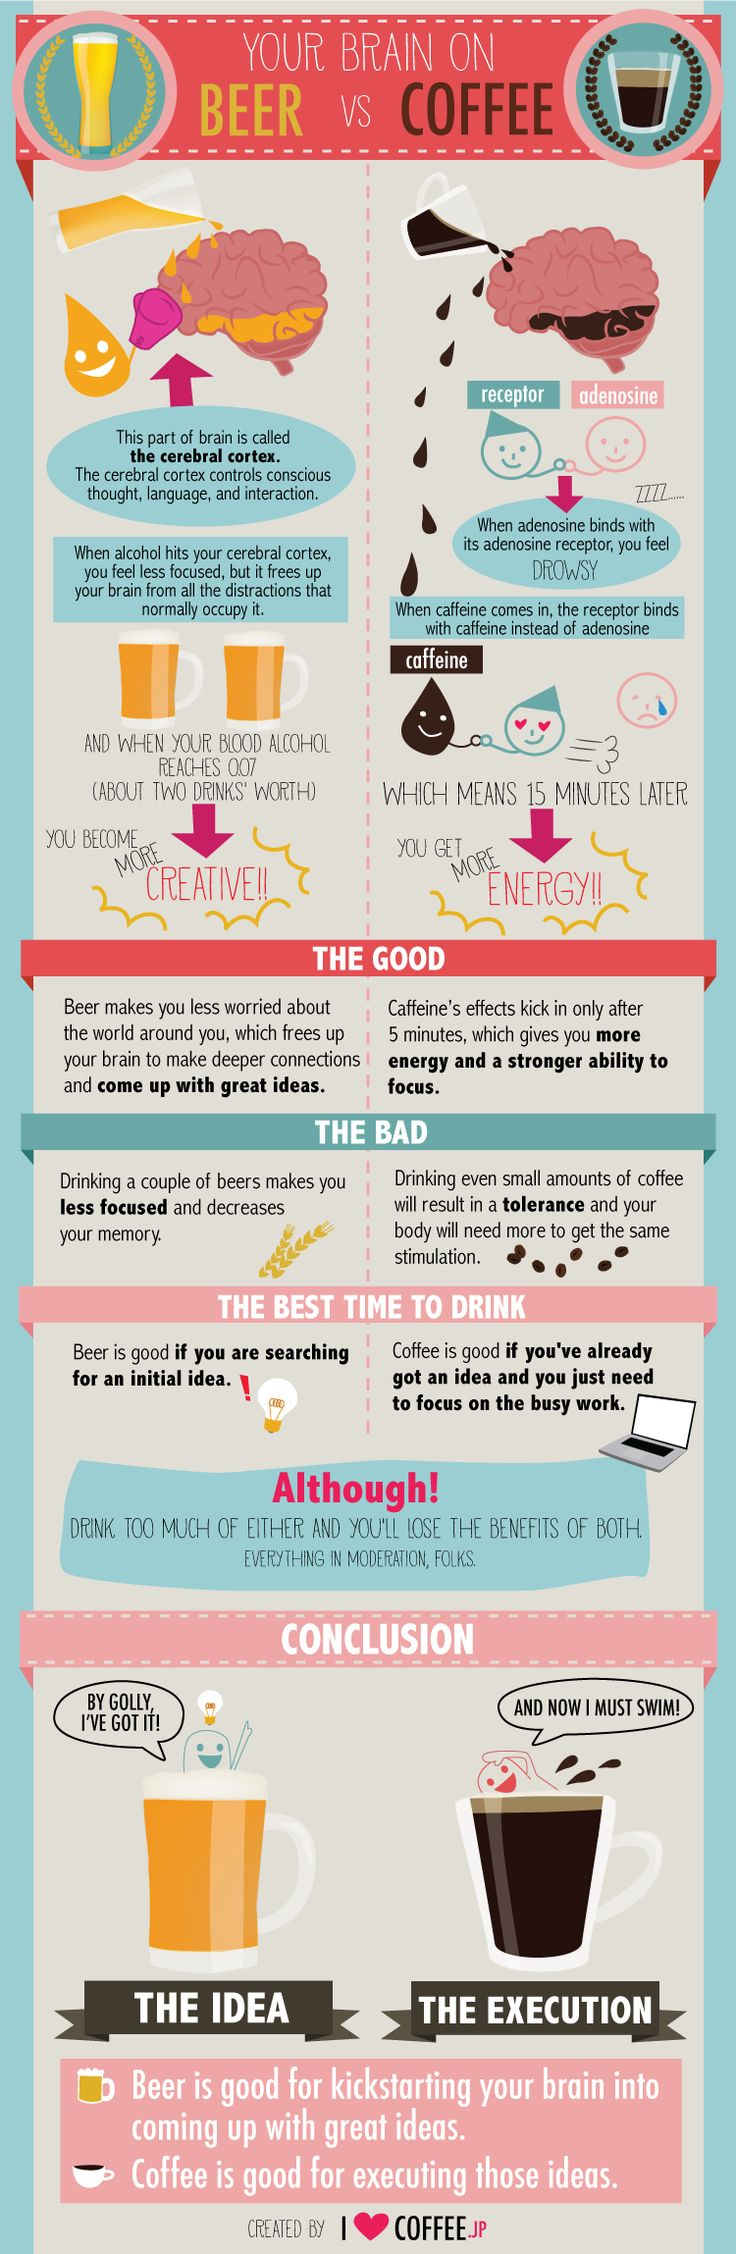 Your brain on BEER vs. COFFEE